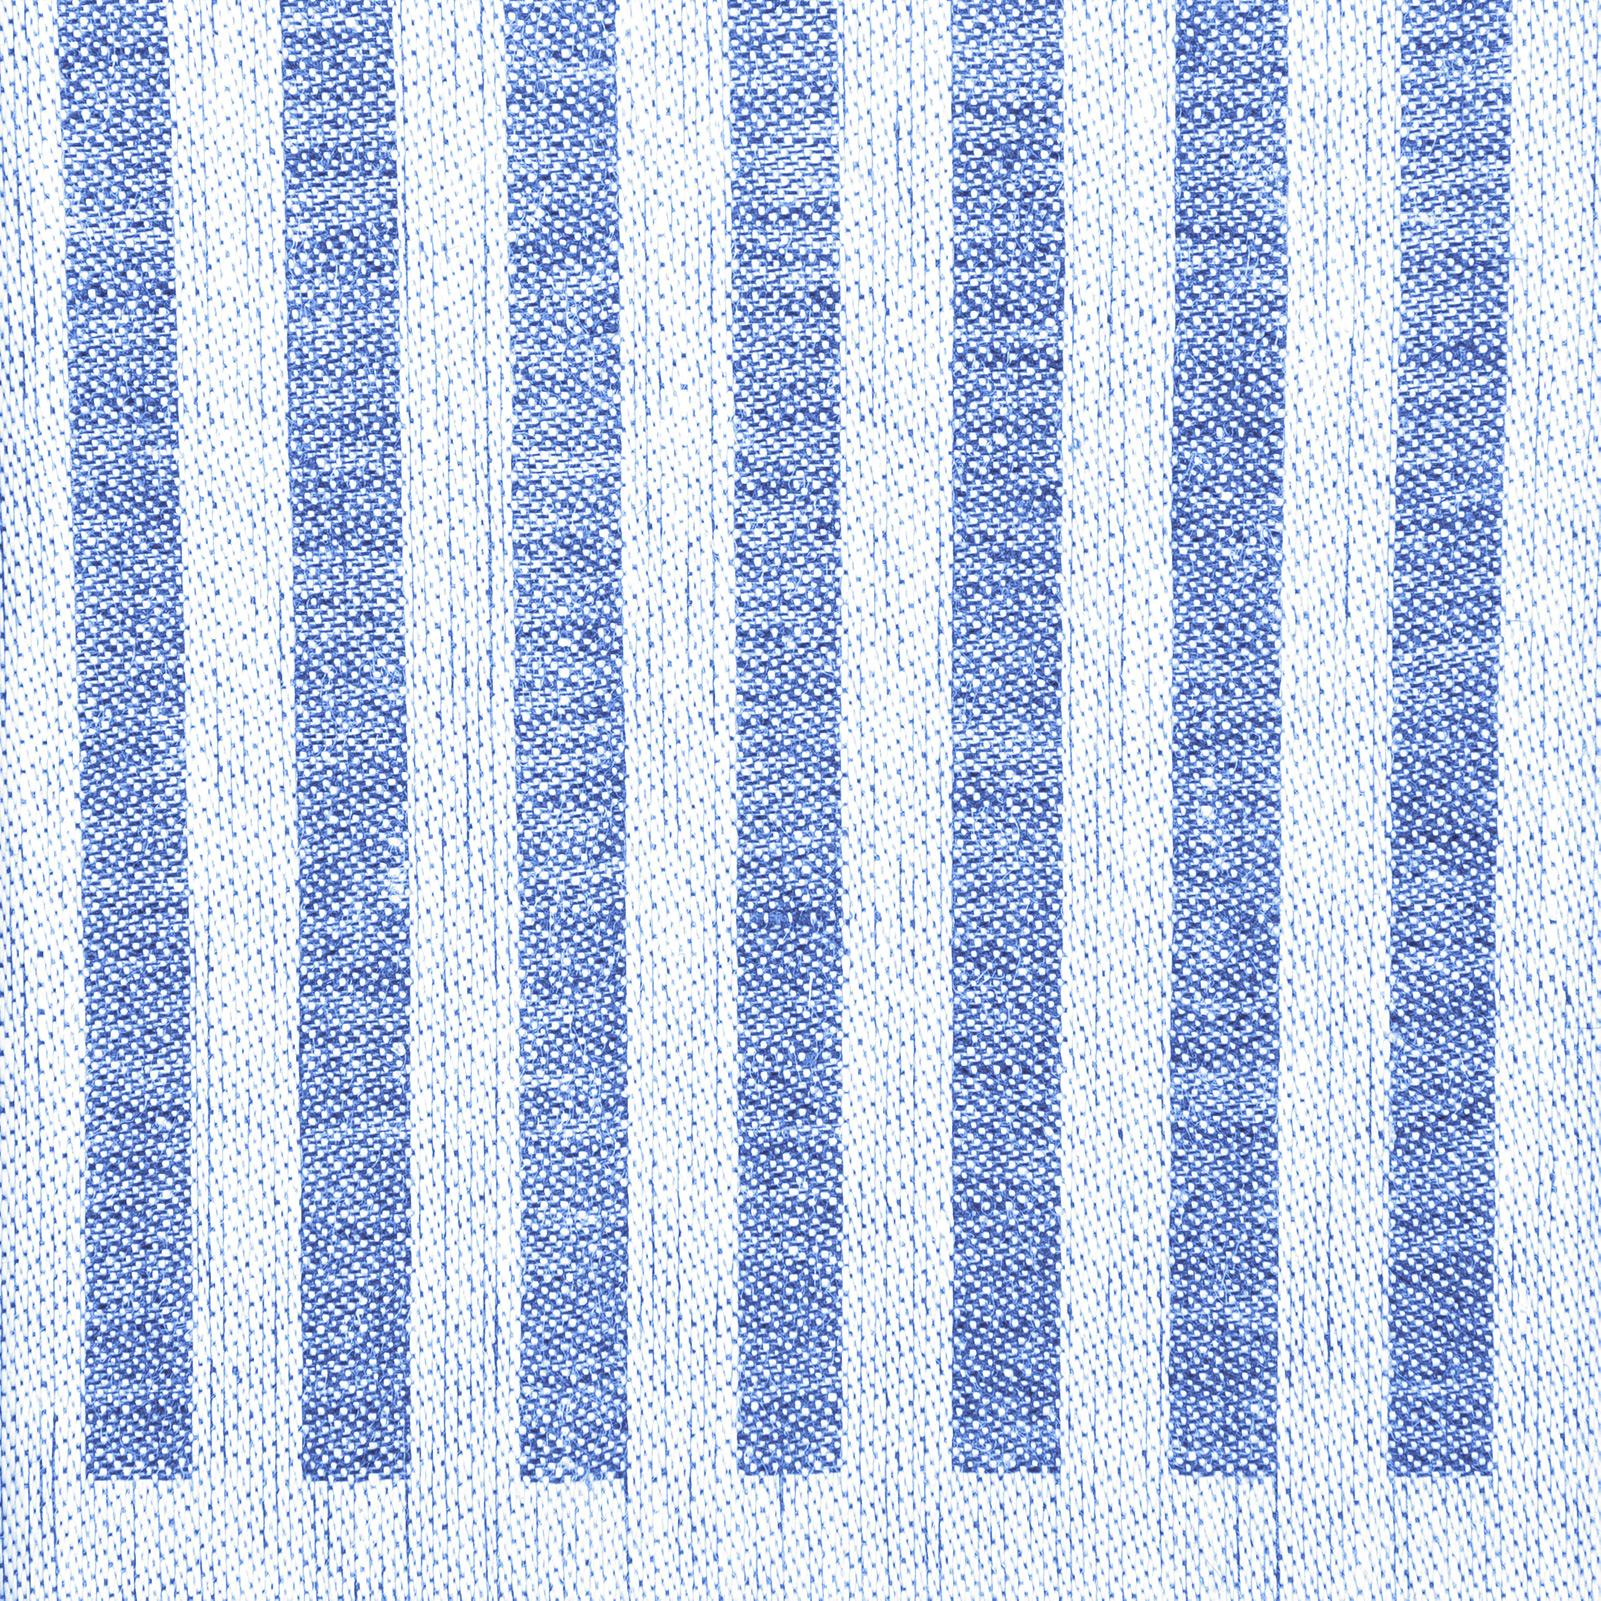 Anne färgprov design Hanne Vedel färg blå